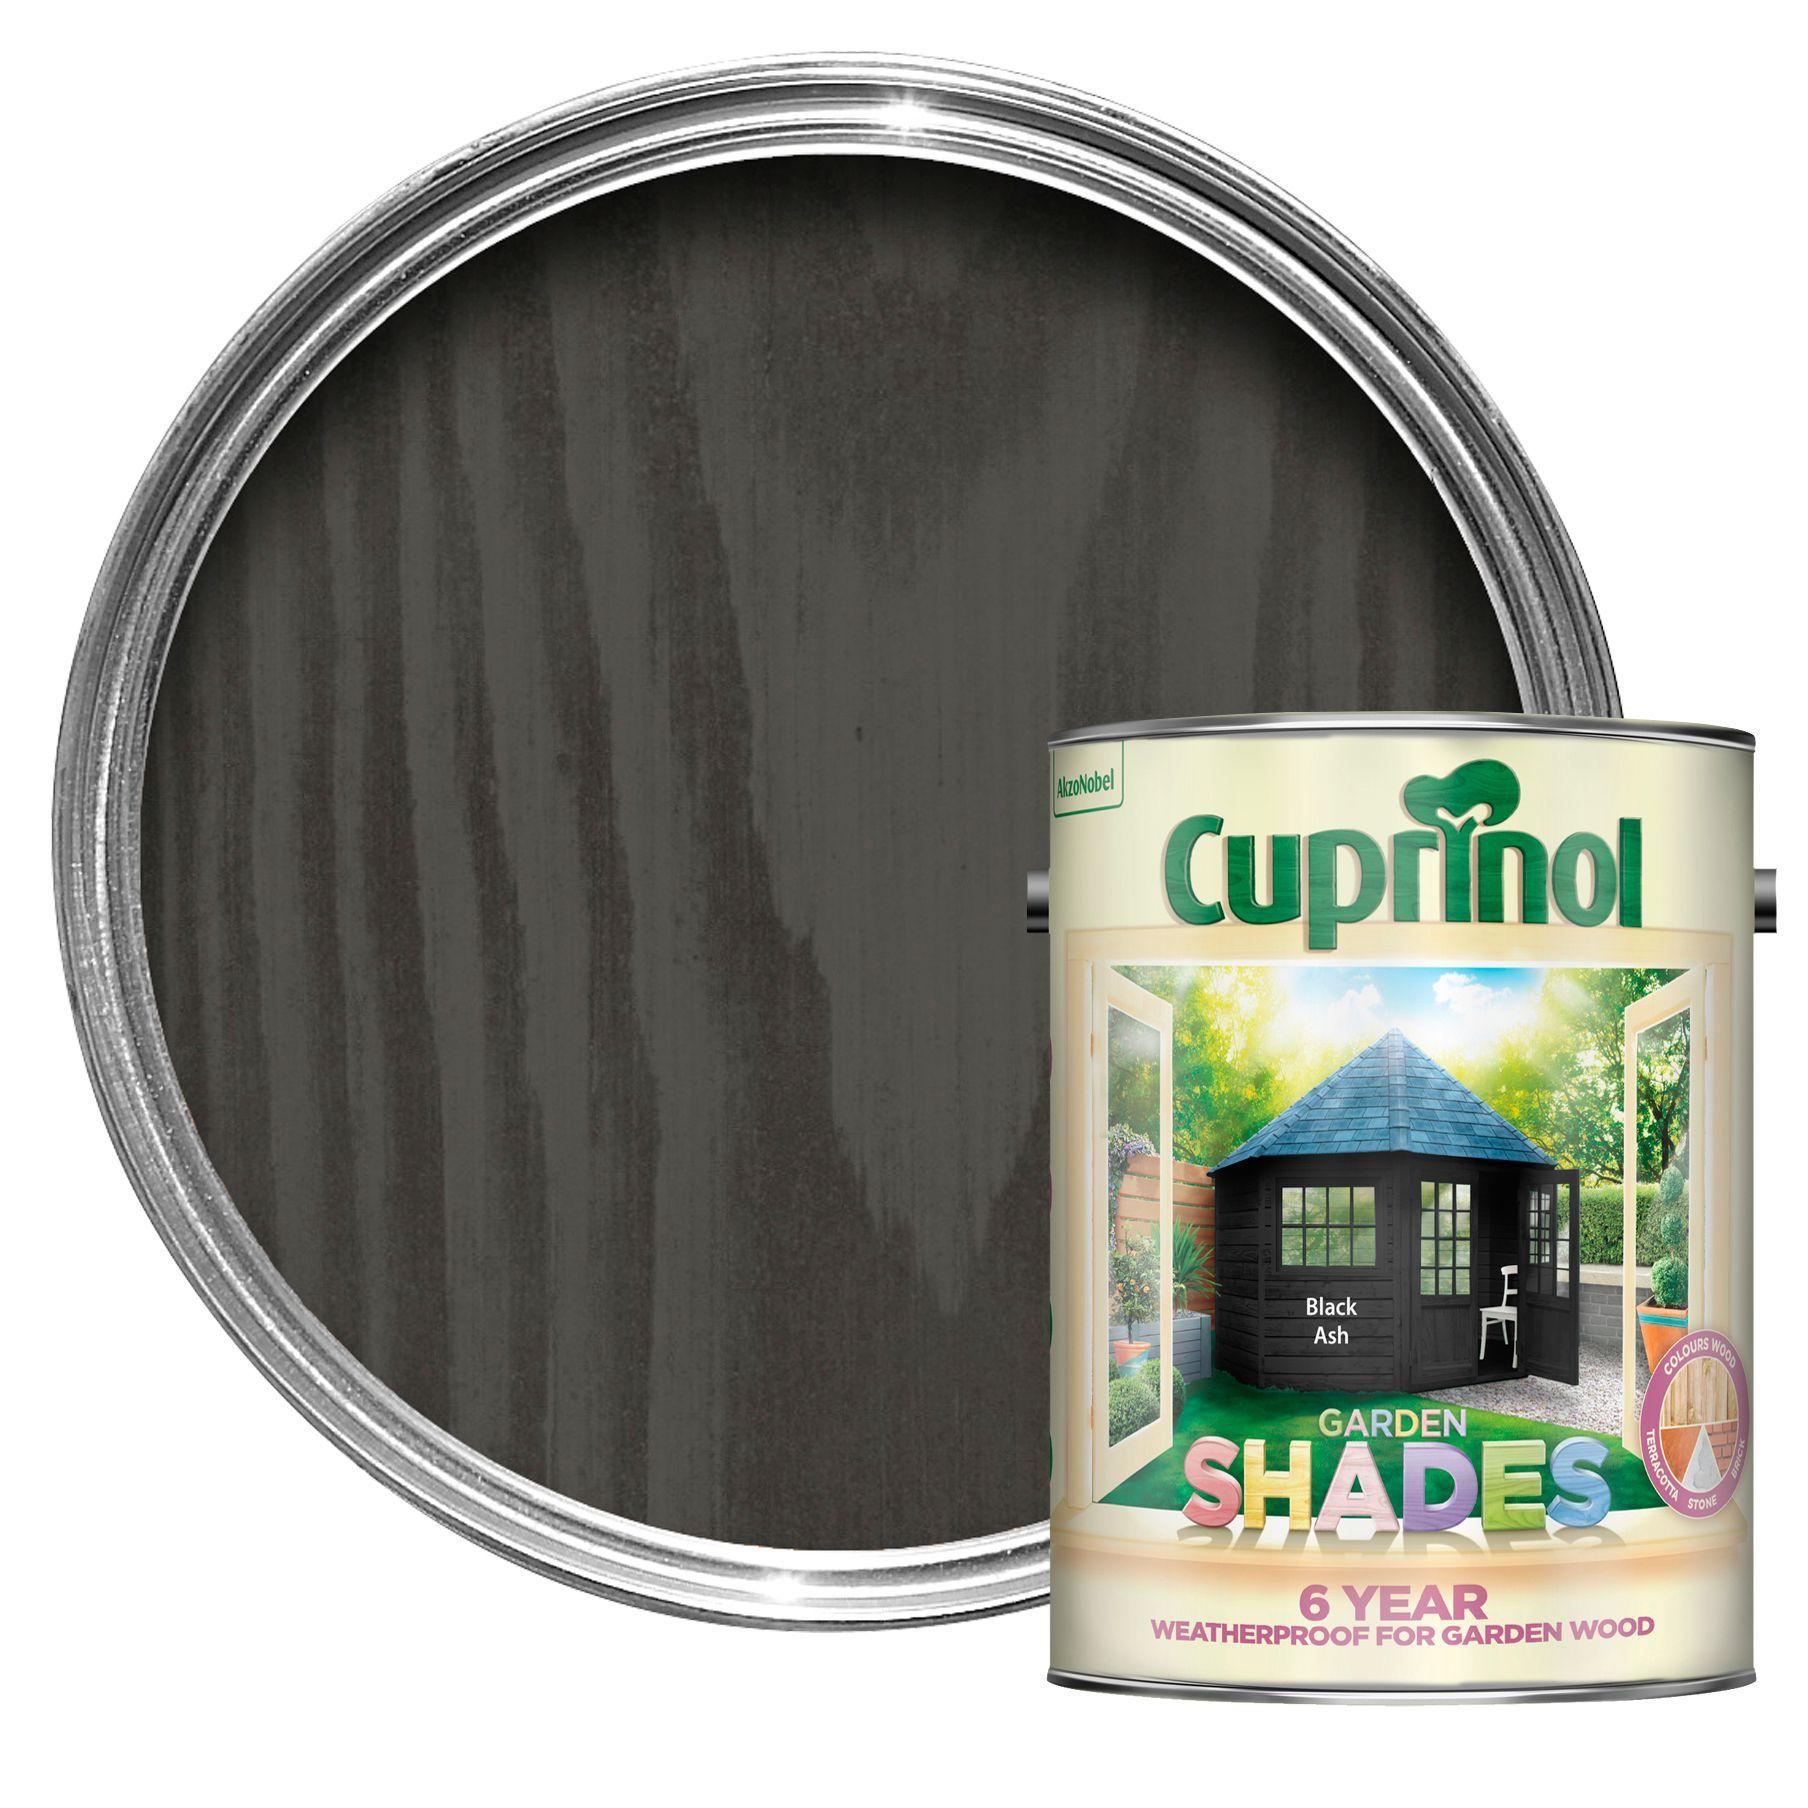 Cuprinol Garden Shades Black Ash Matt Wood Paint 5L